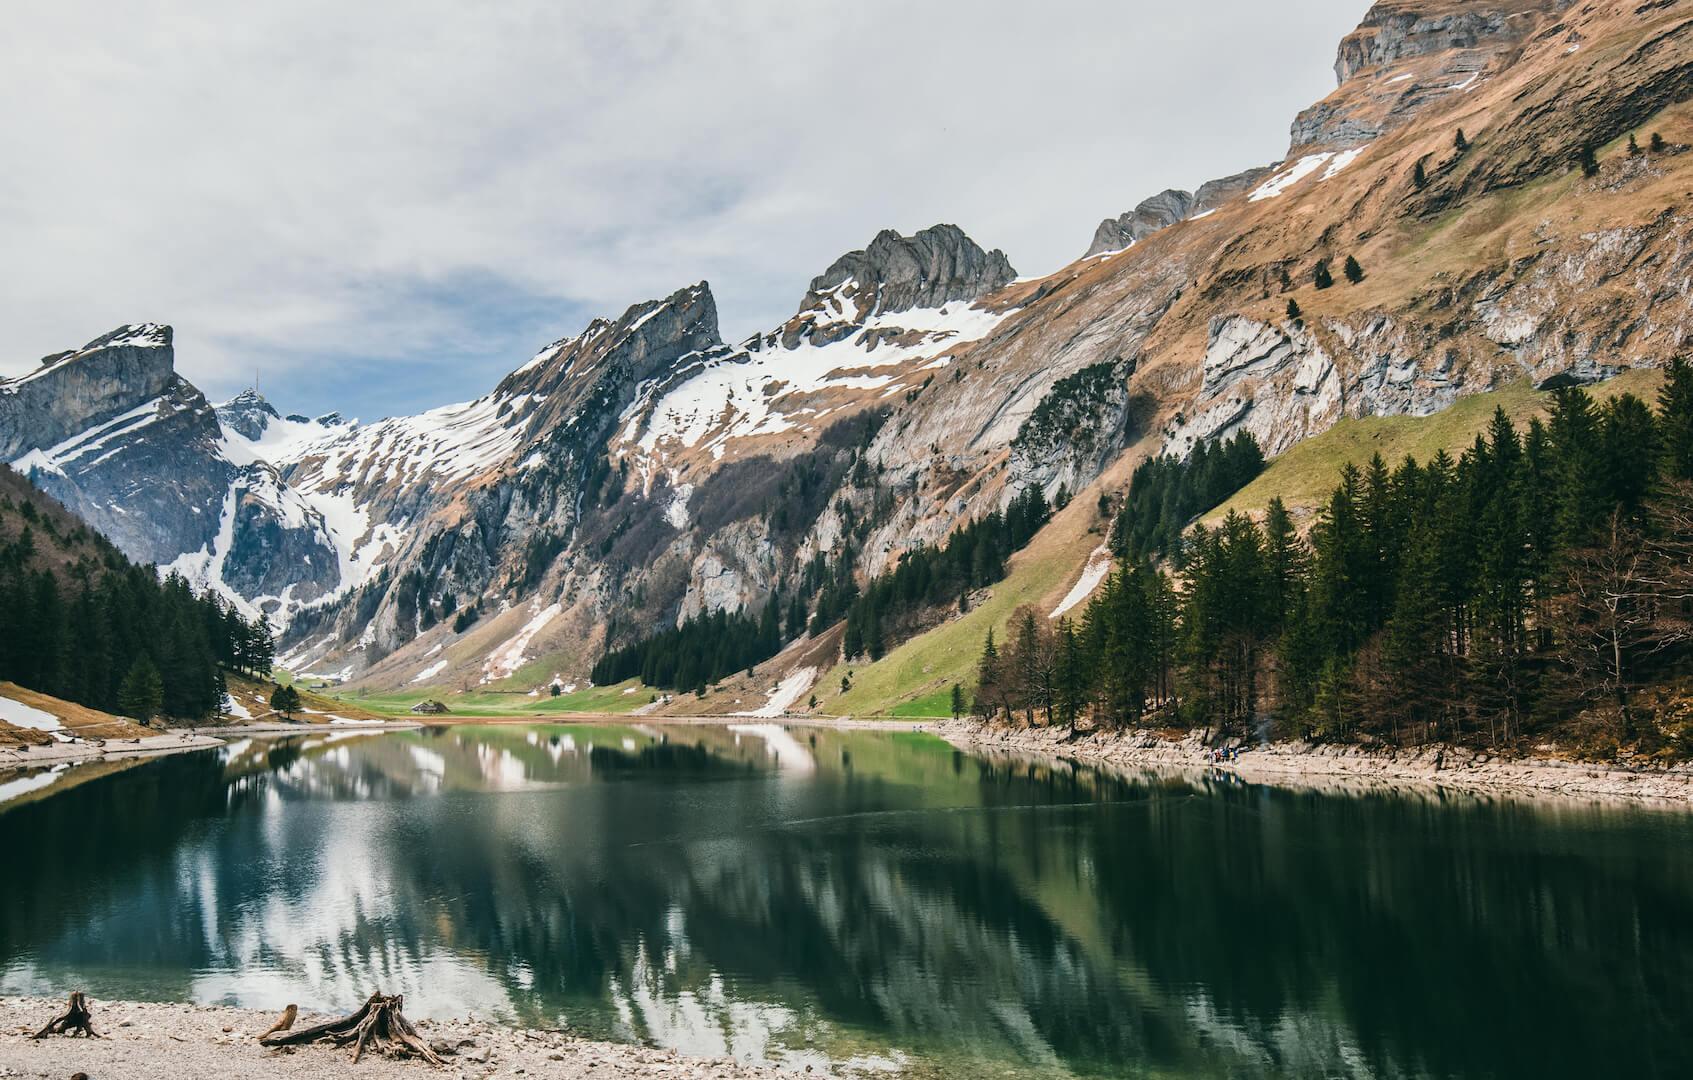 schweiz appenzeller-land seealpsee wandern see berge schnee